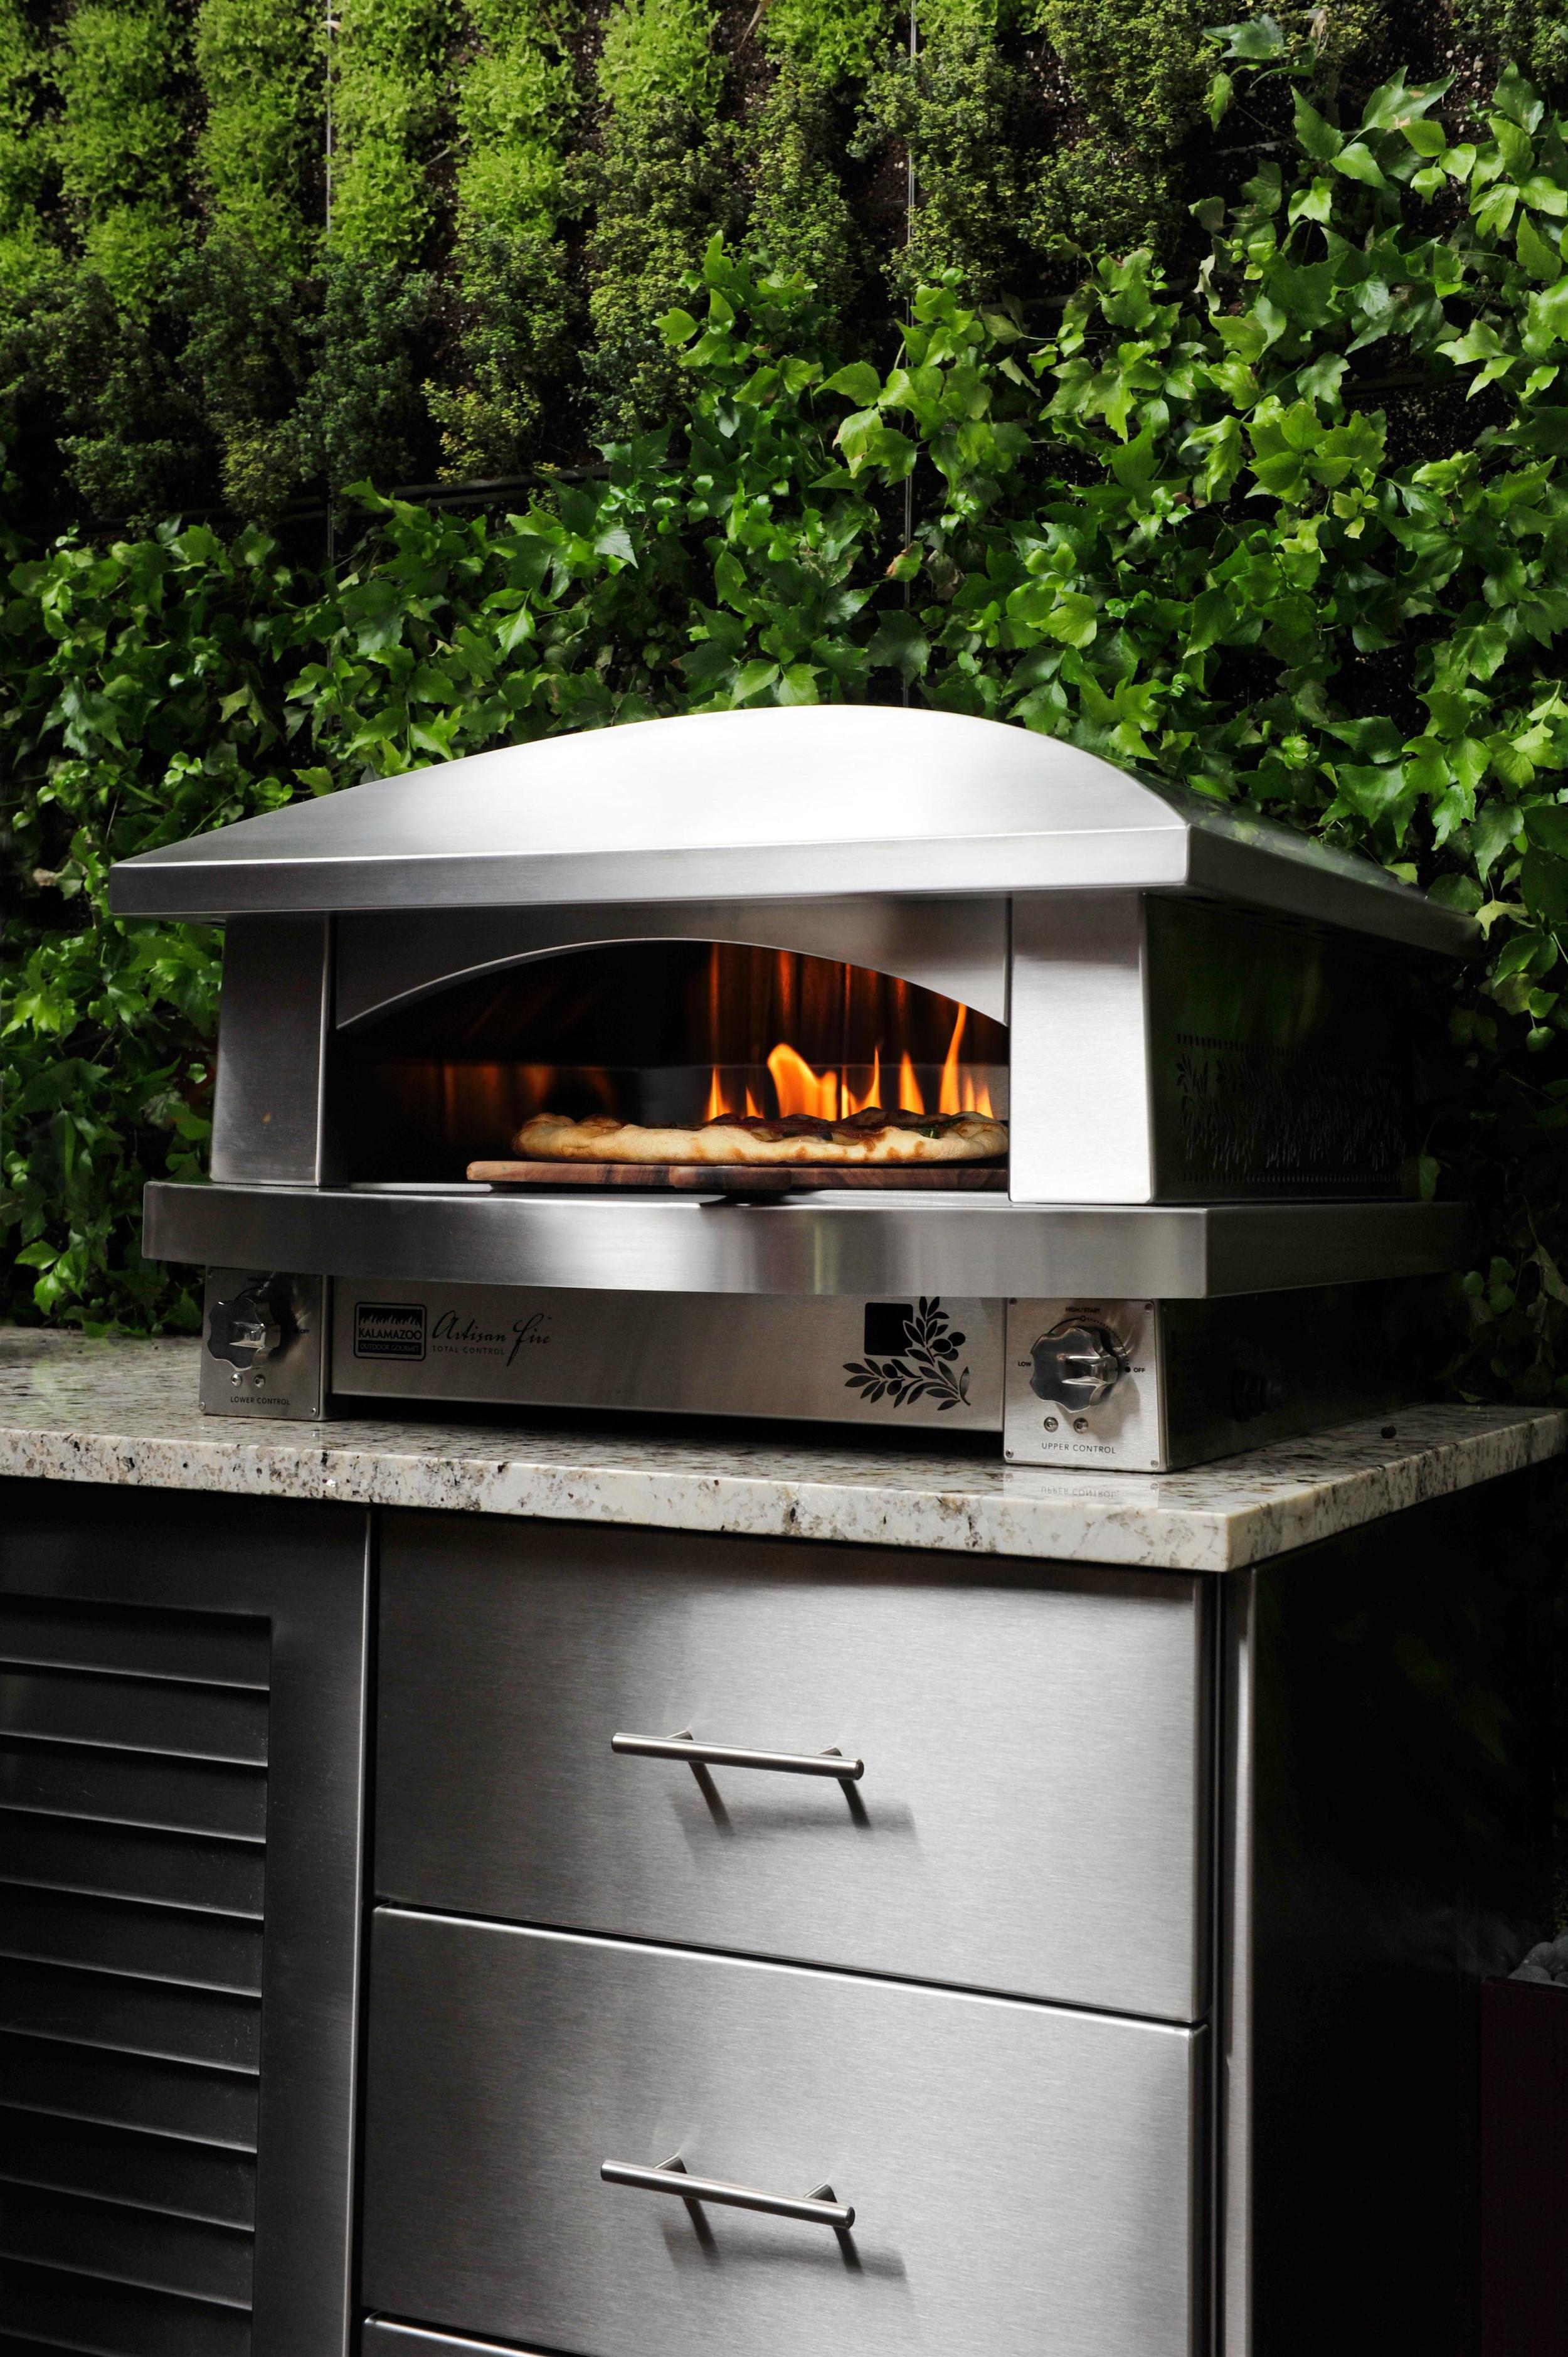 Kalamazoo_Outdoor_Gourmet_Artisan_Fire_Pizza_Oven_Green_Wall_Vertical.JPG